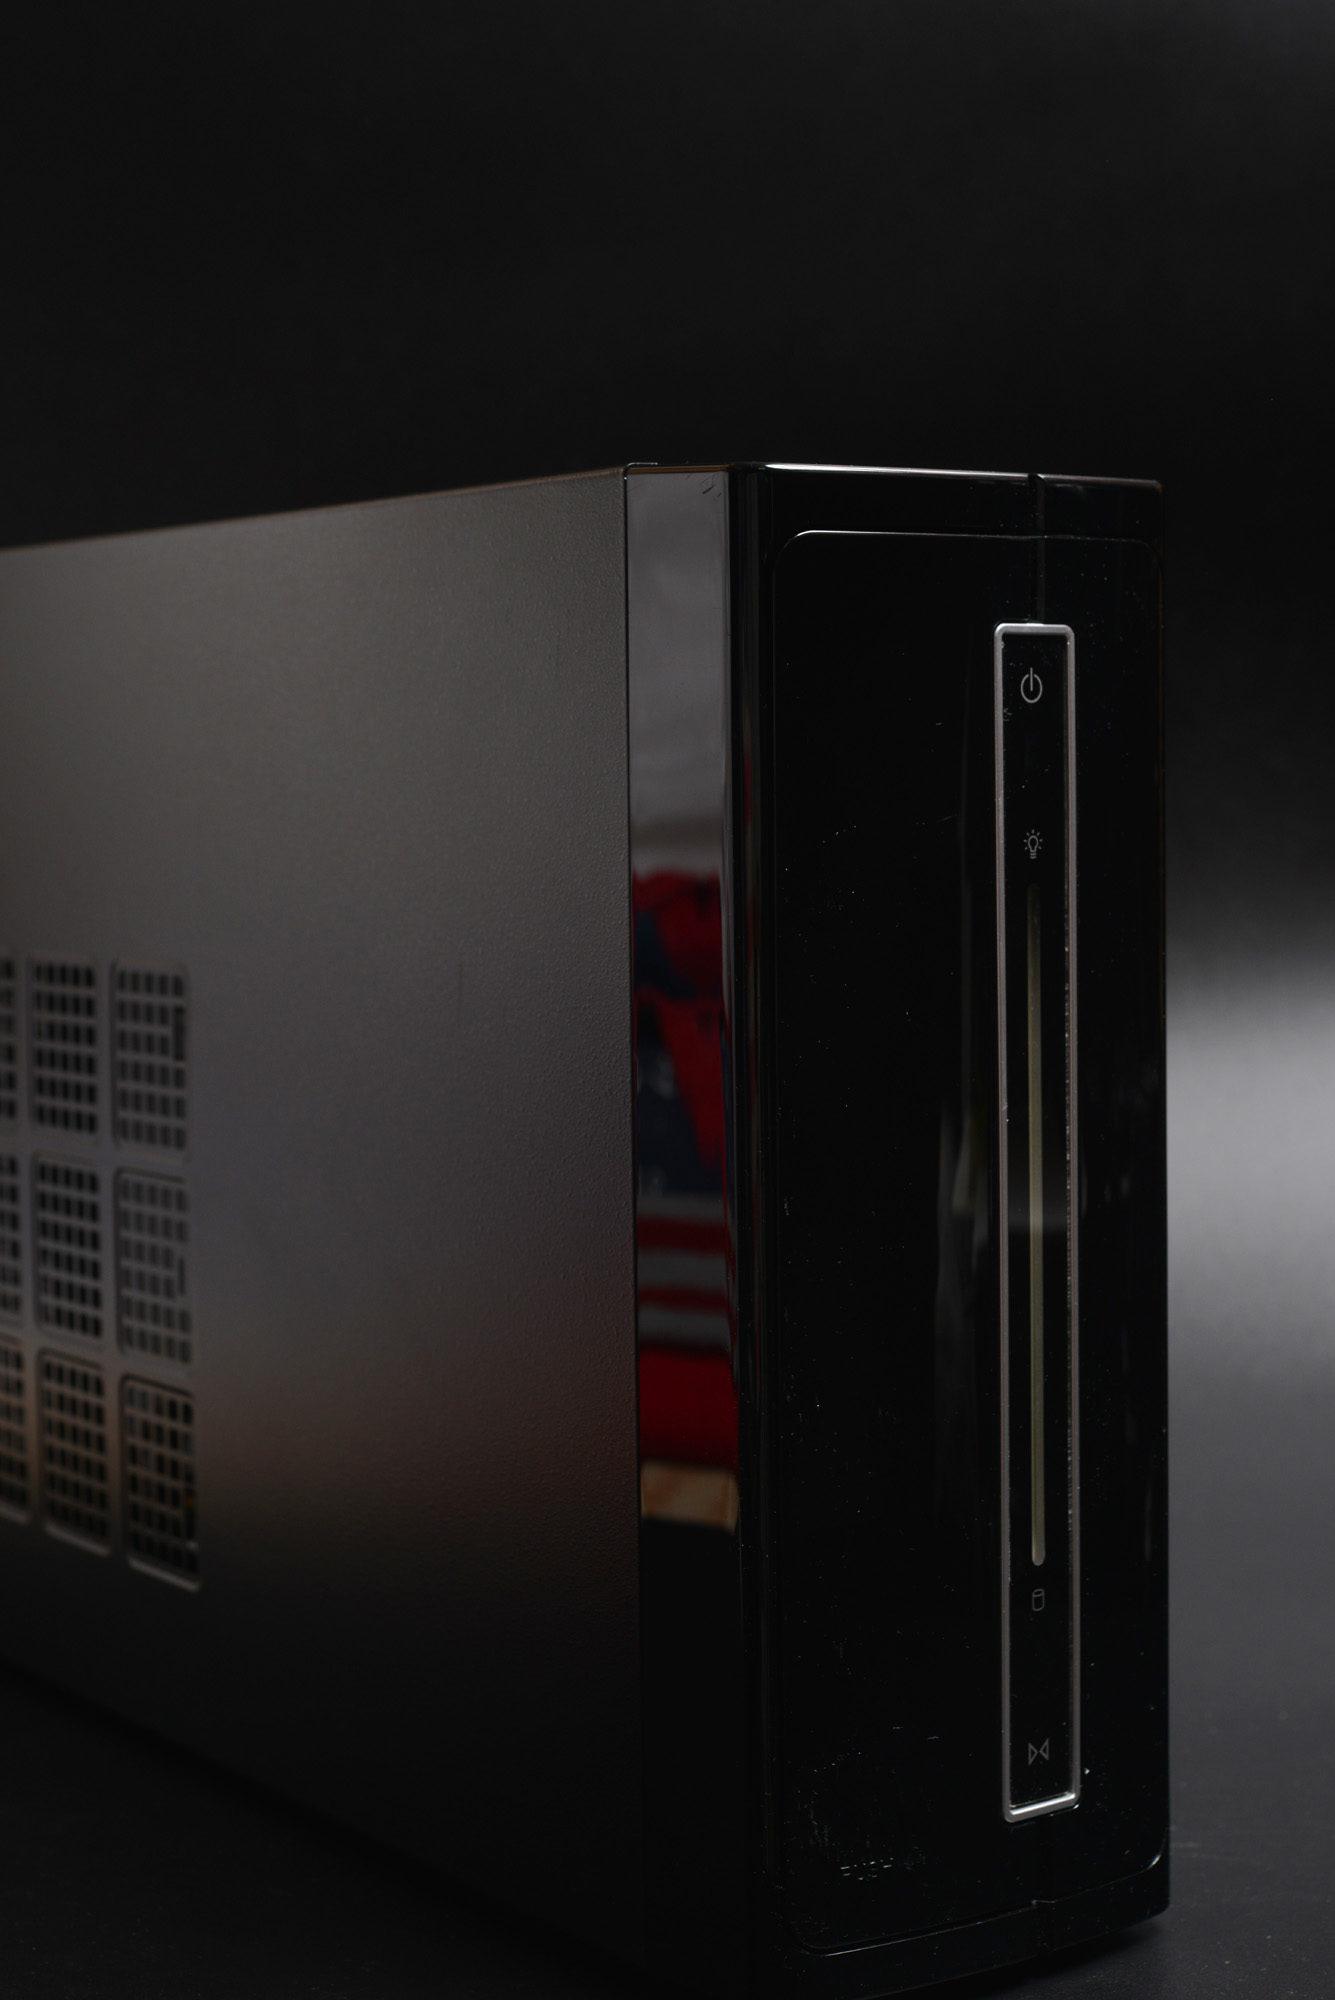 Mini-ITX ケース ワンコインでGET! IW-BP671B/300H IP-S300FF1-0(H)